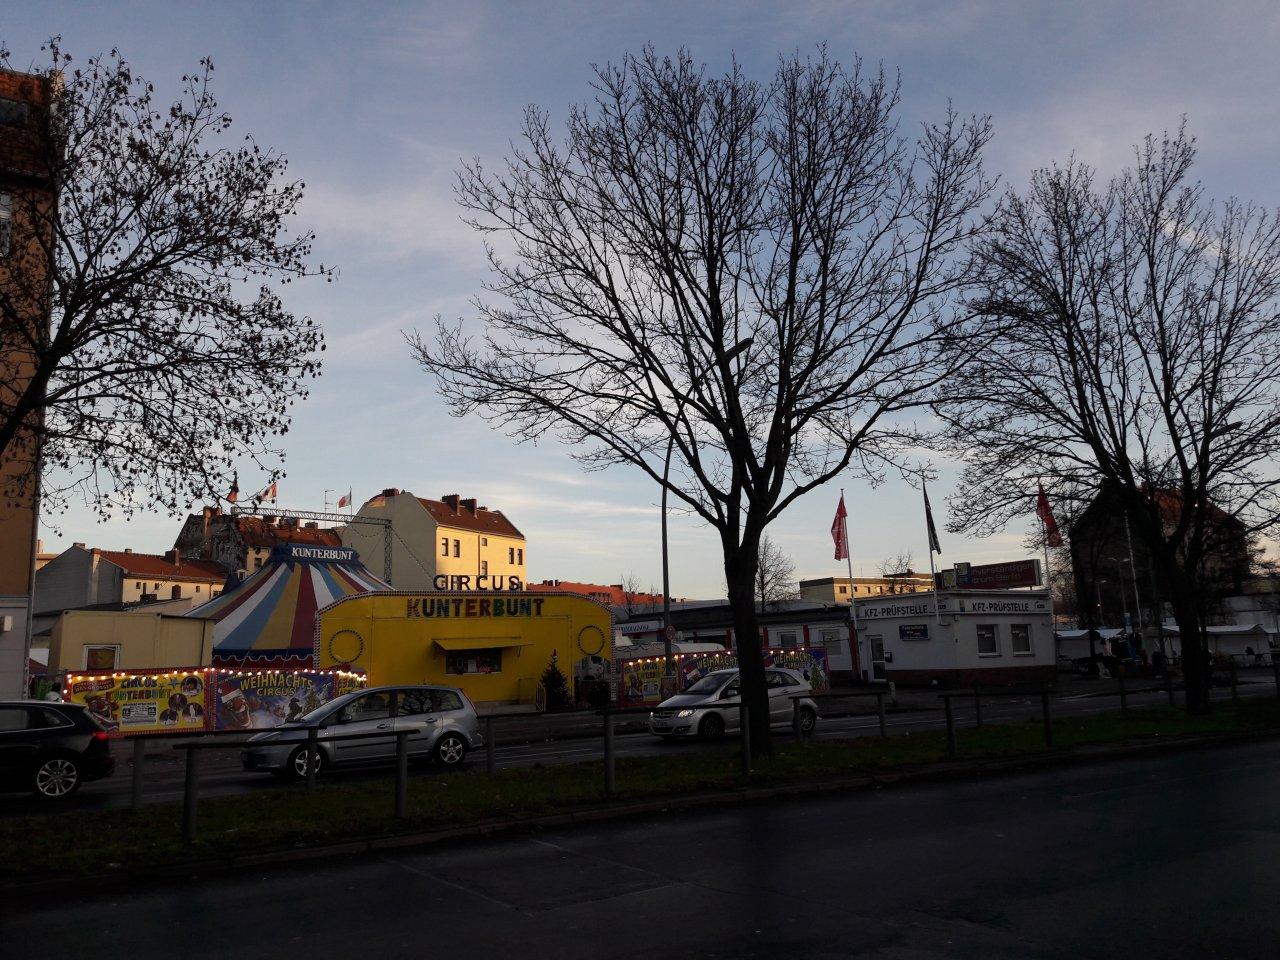 Circus-Markstrasse-Reinickendorf.jpg